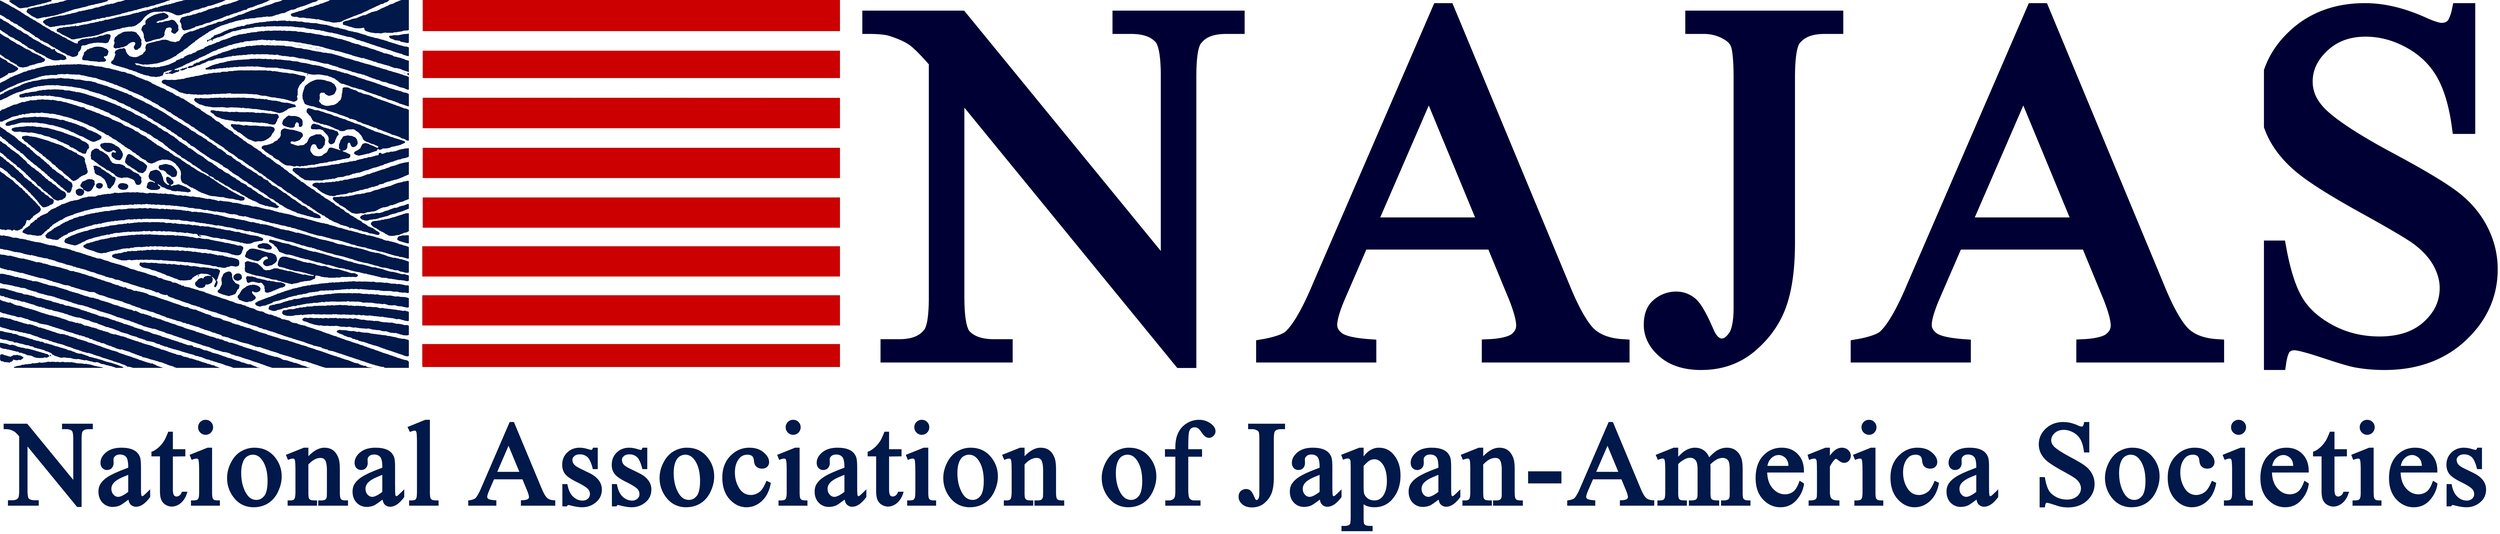 NAJAS logo-highres.jpg